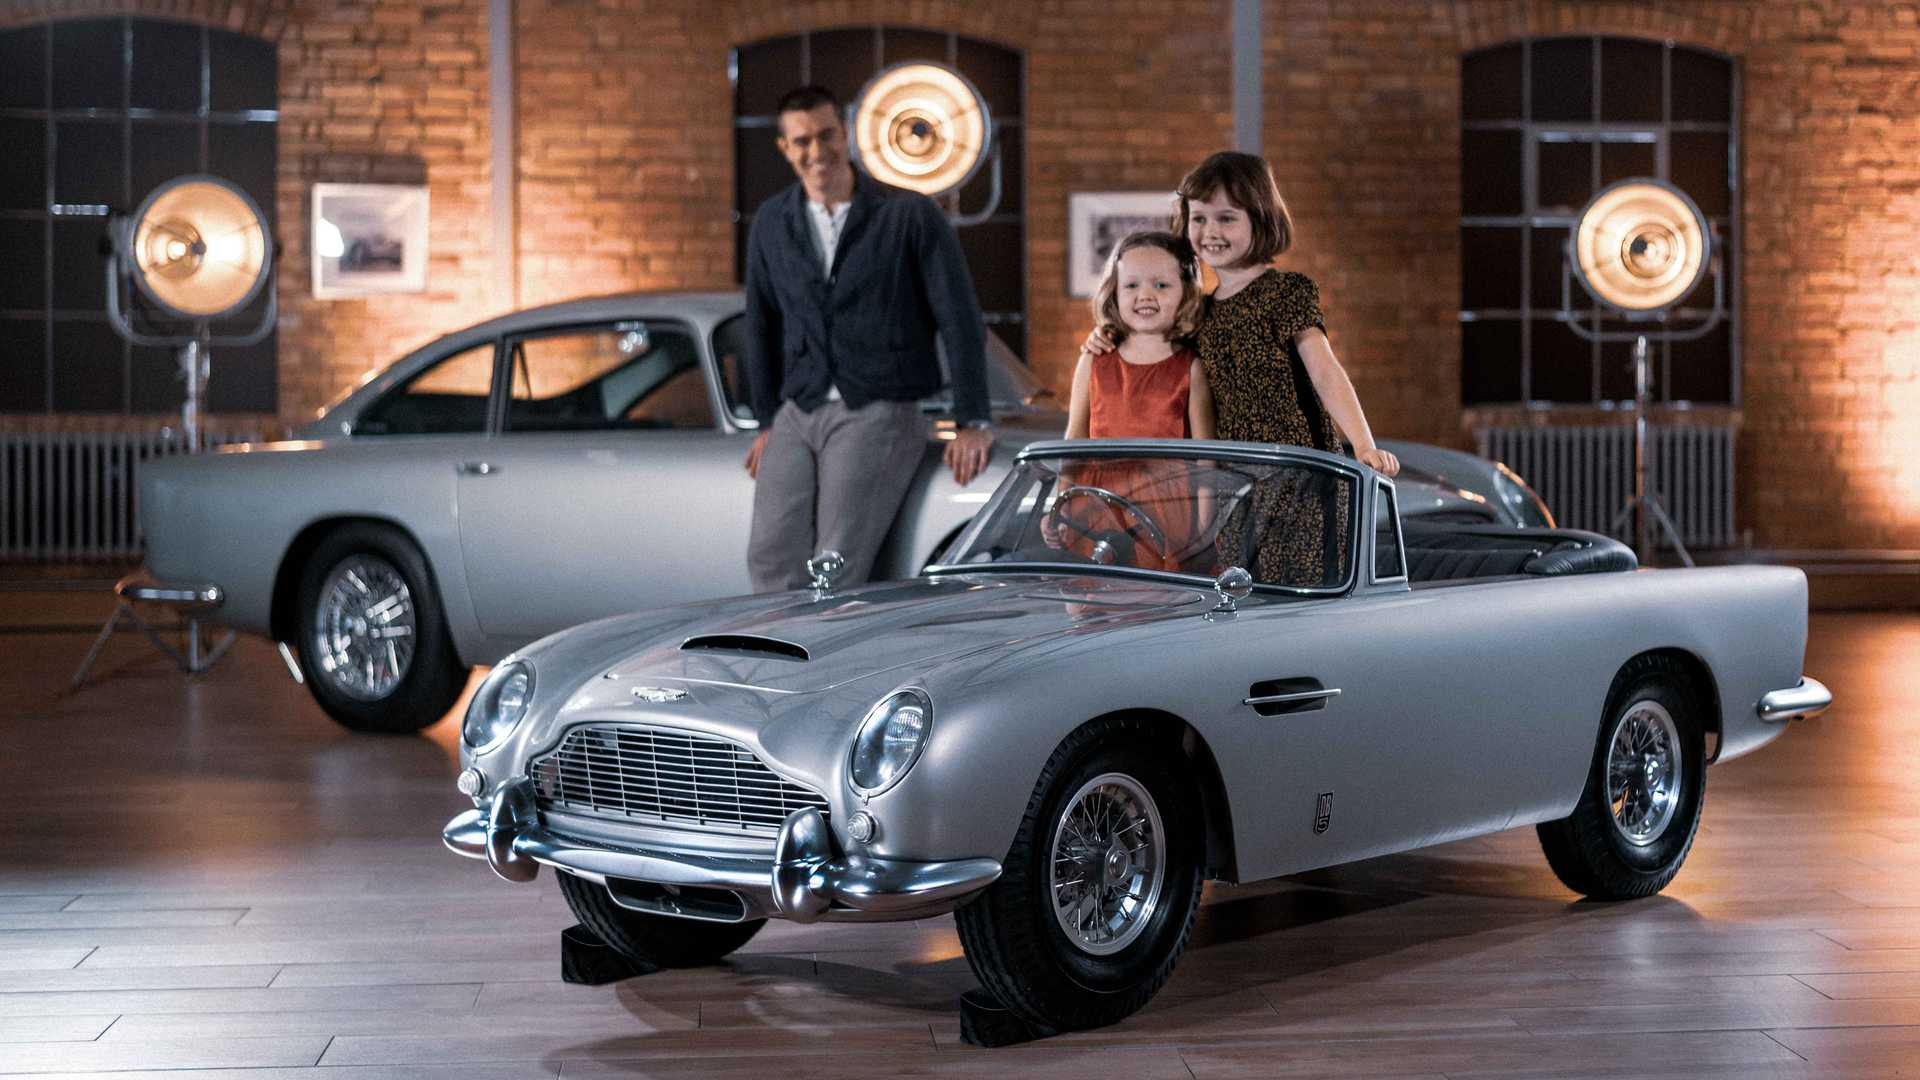 Aston Martin Db5 Junior Is A Vintage Styled Ev For Kids